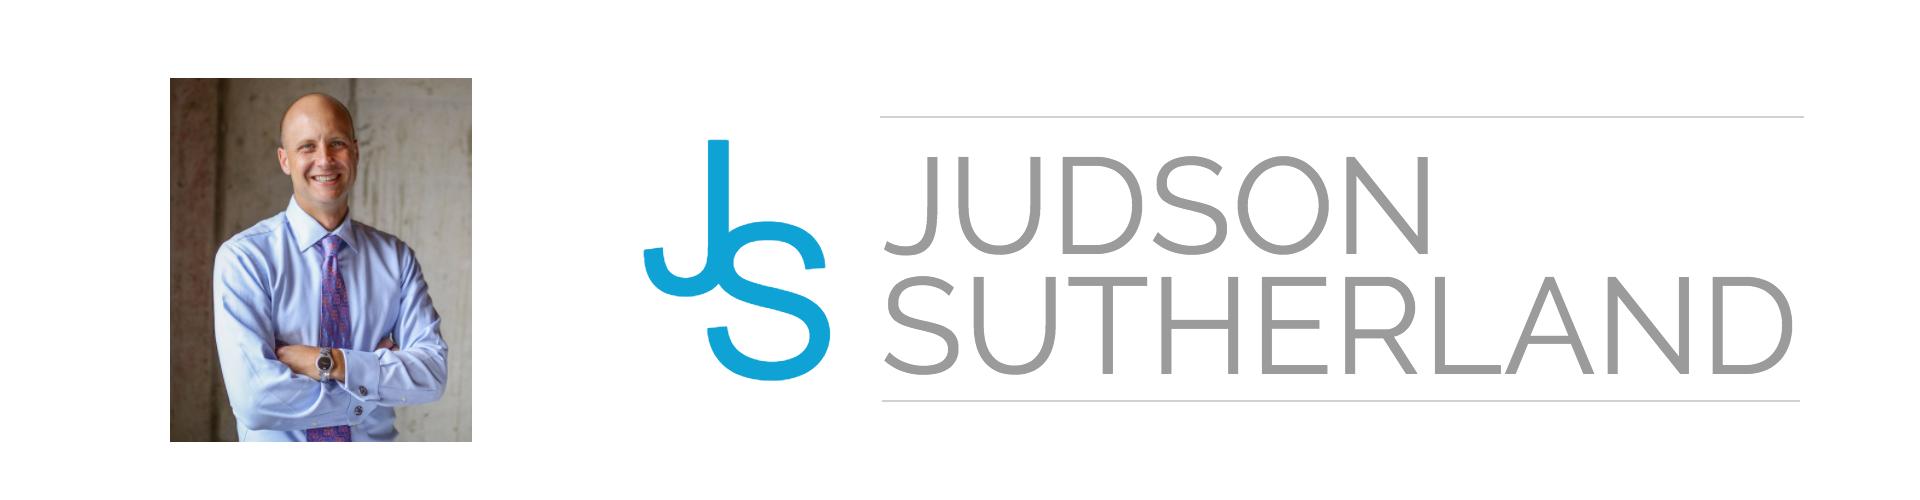 Judson Sutherland's Blog